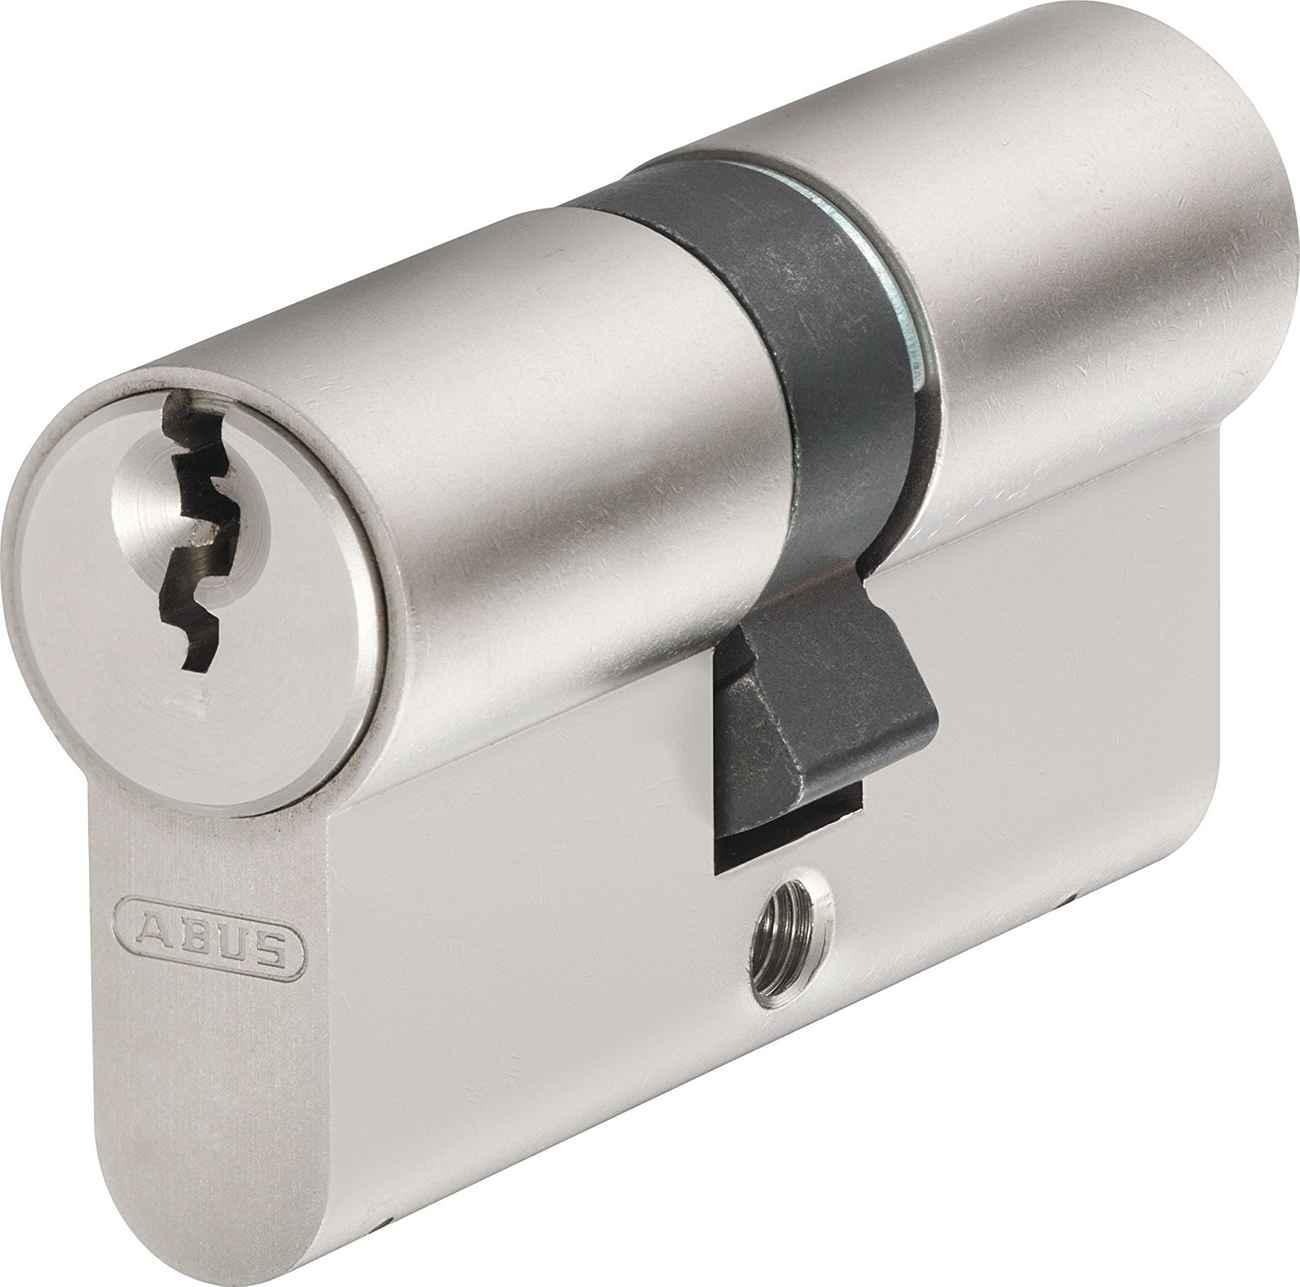 Abus Profilzylinder D6X 35/35 mm, 5 Schlüssel, Codekarte